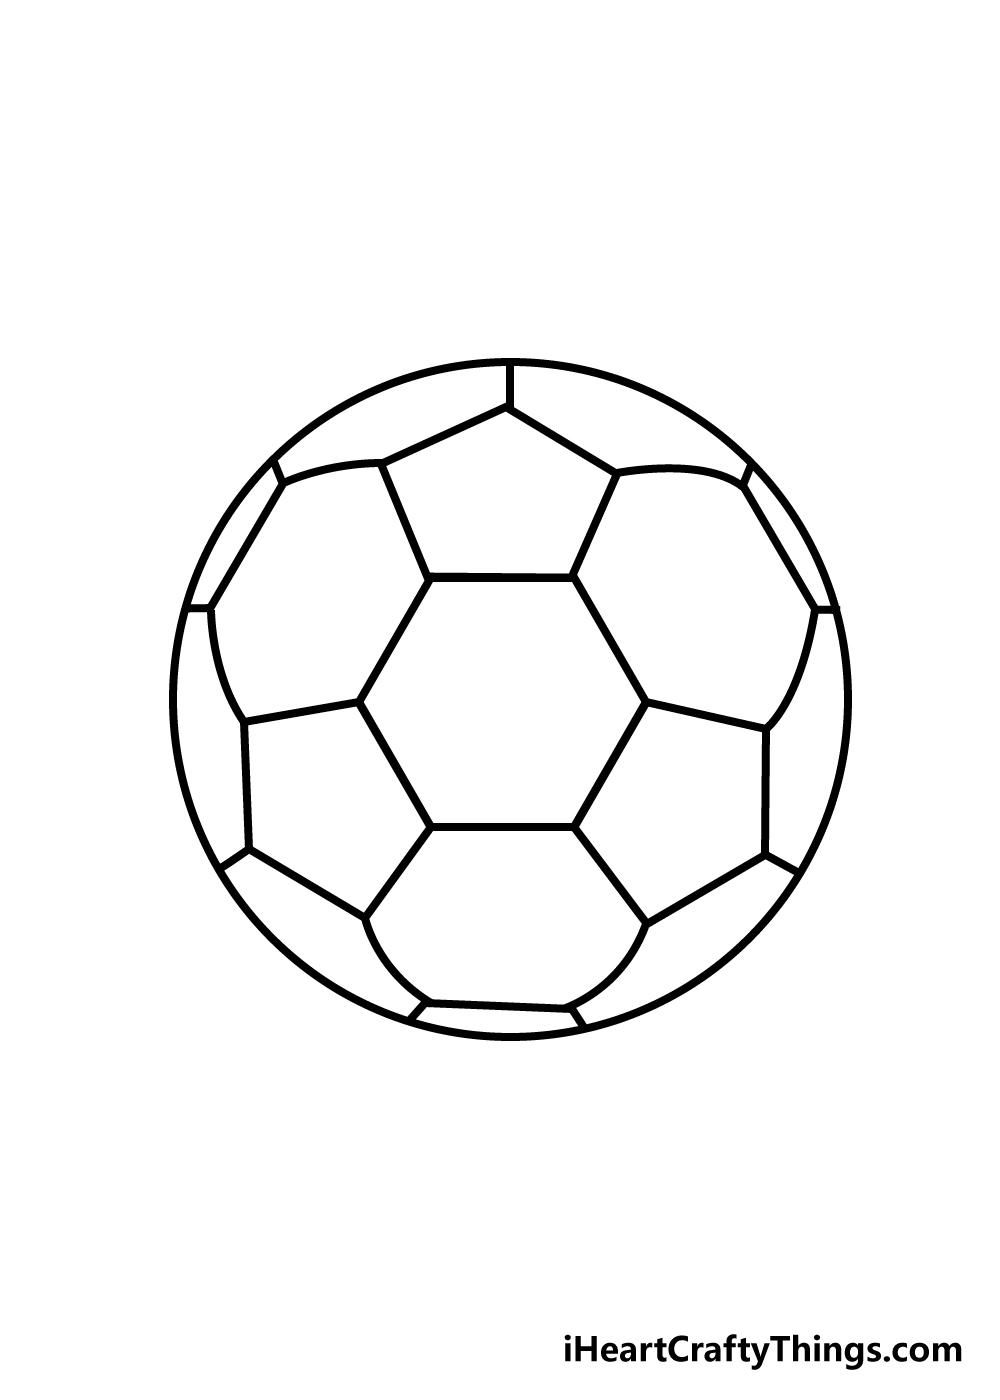 soccer ball drawing step 5